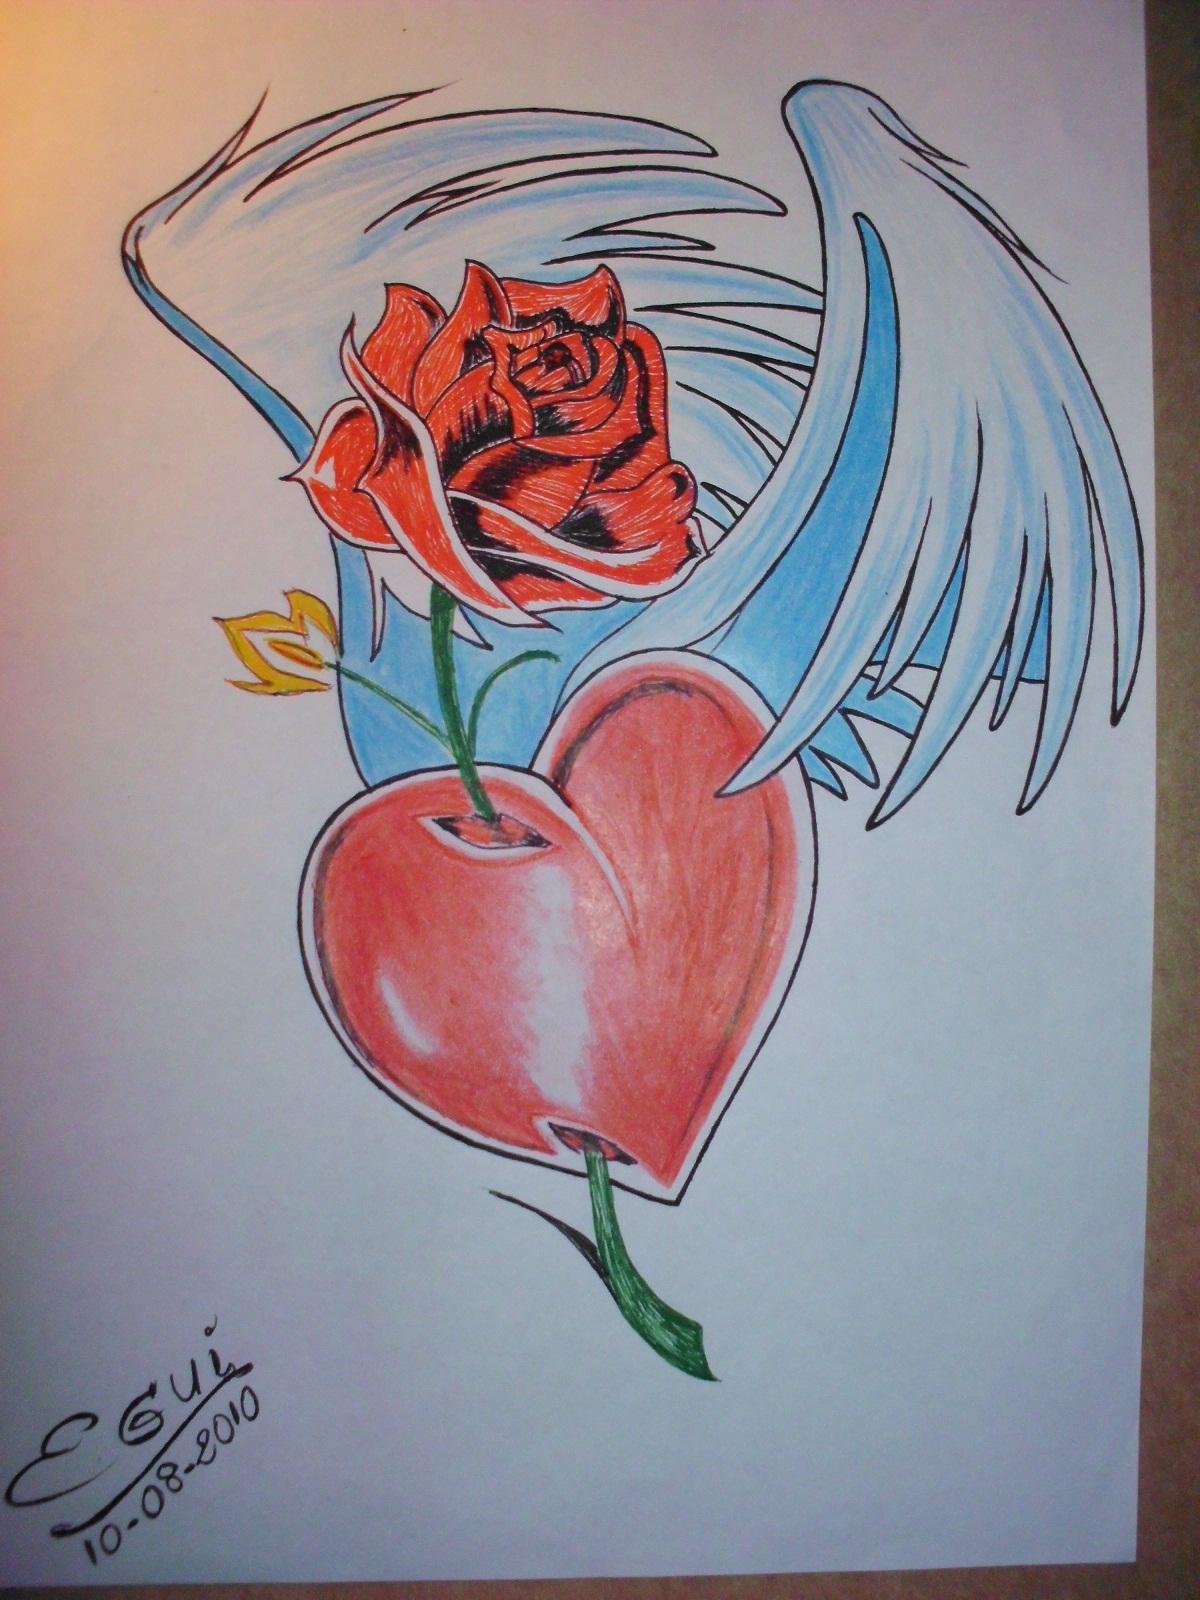 Images For > Dibujos A Lapiz De Corazones Con Alas